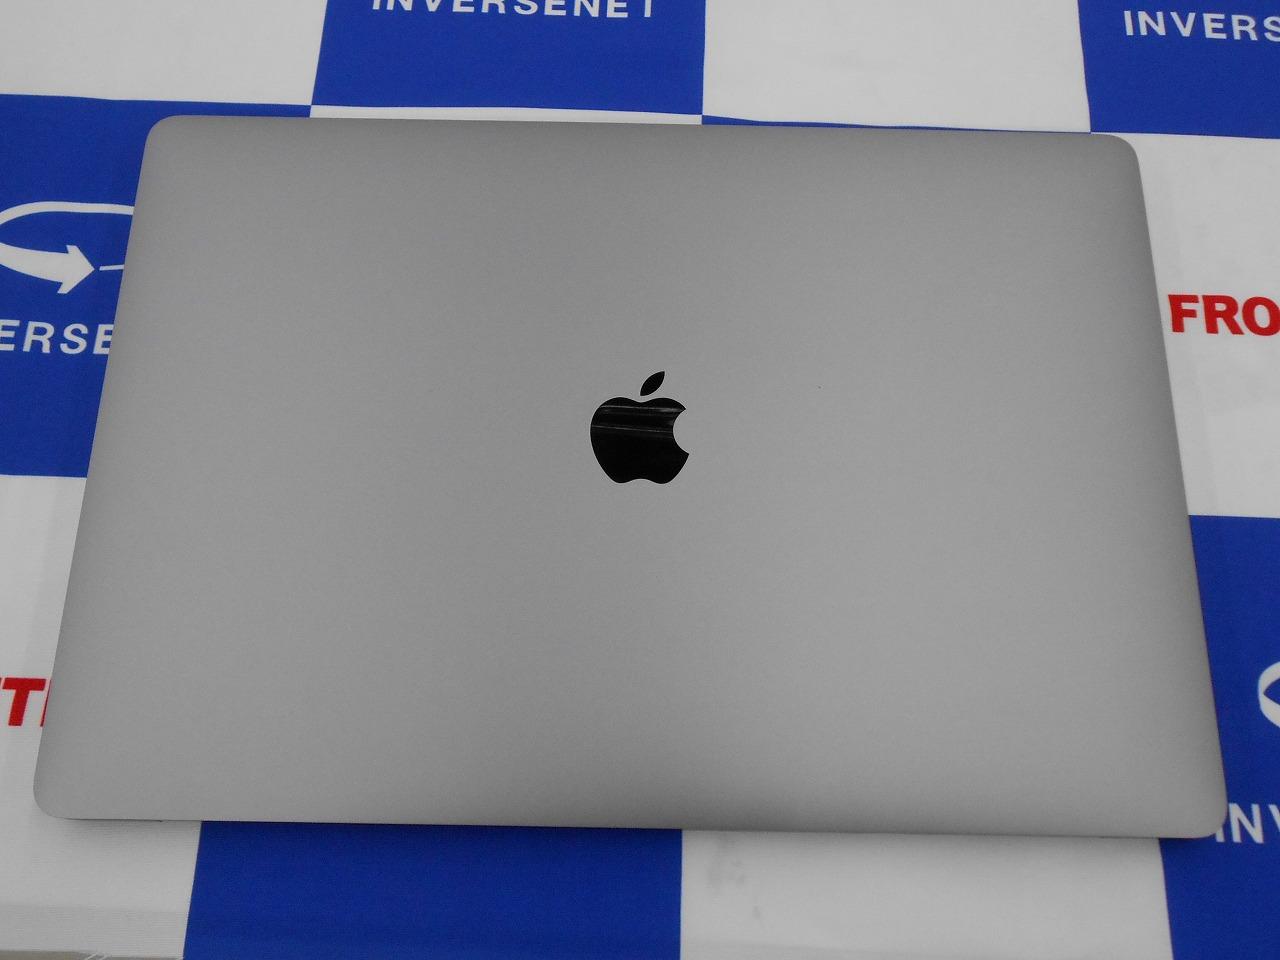 Aランク【決算セール】【中古】 Apple MacBookPro MR932J/A/Mid2018/Corei7 2.2GHz/メモリ16GB/SSD256GB/15インチ/Mac OS X Catalina【3ヶ月保証】【足立店発送】